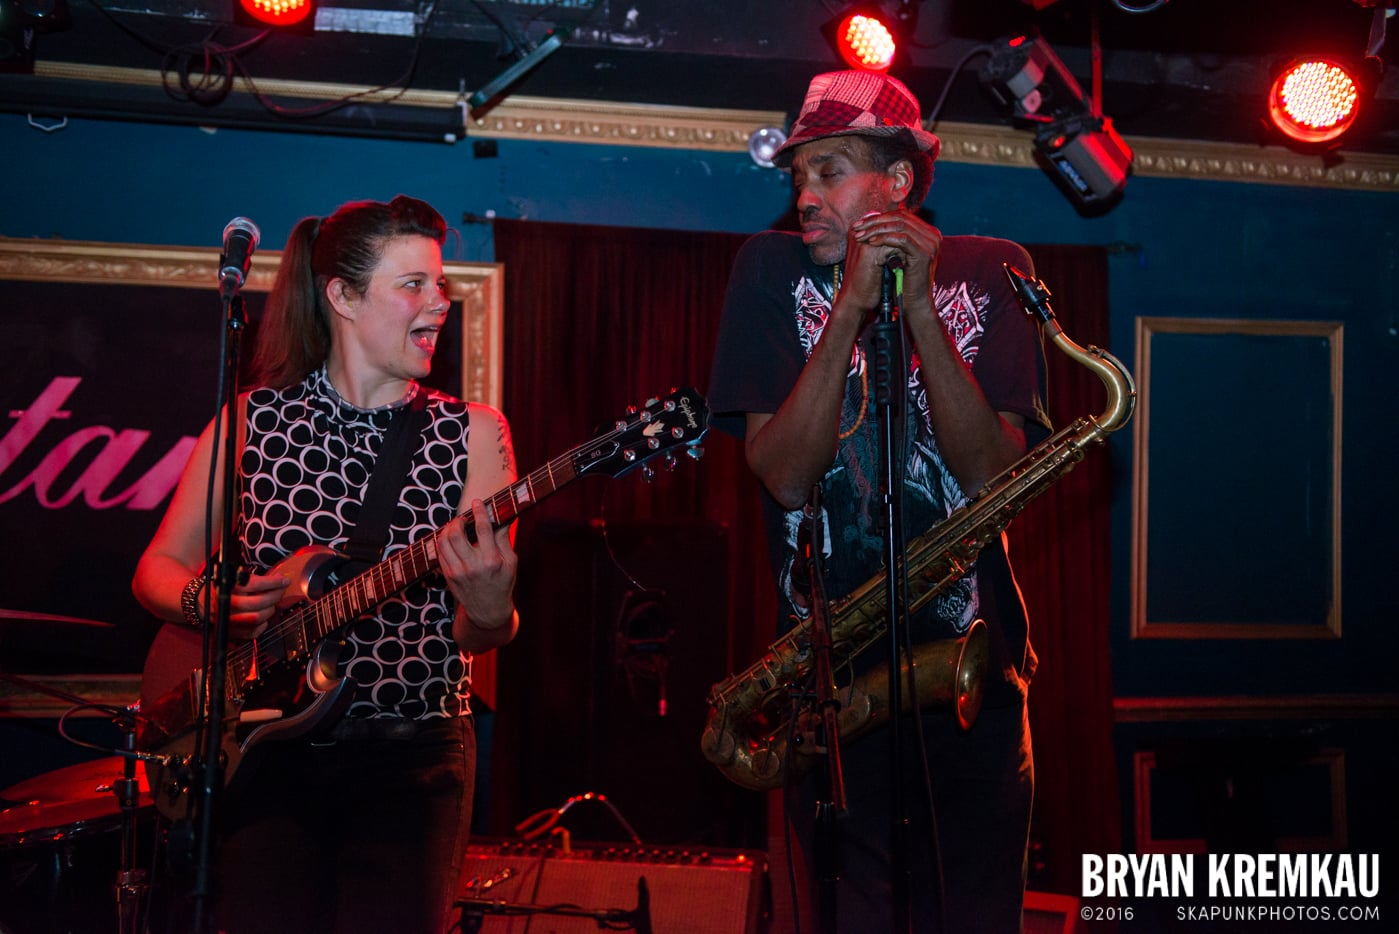 Roddy Radiation & The Scotch Bonnets @ Fontana's, NYC - 4.25.15 (16)